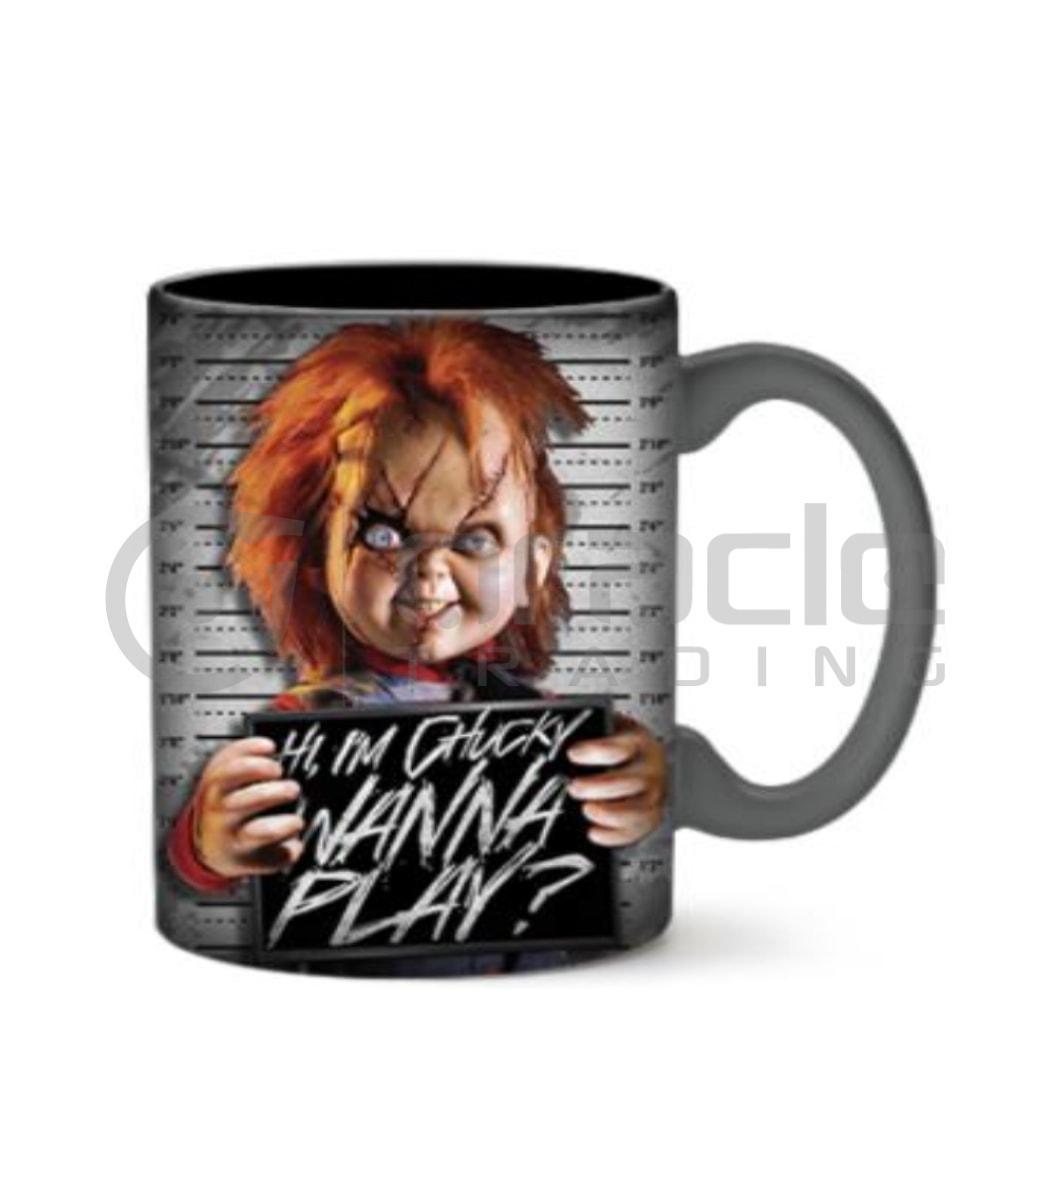 Chucky Jumbo Mug - Wanna Play?